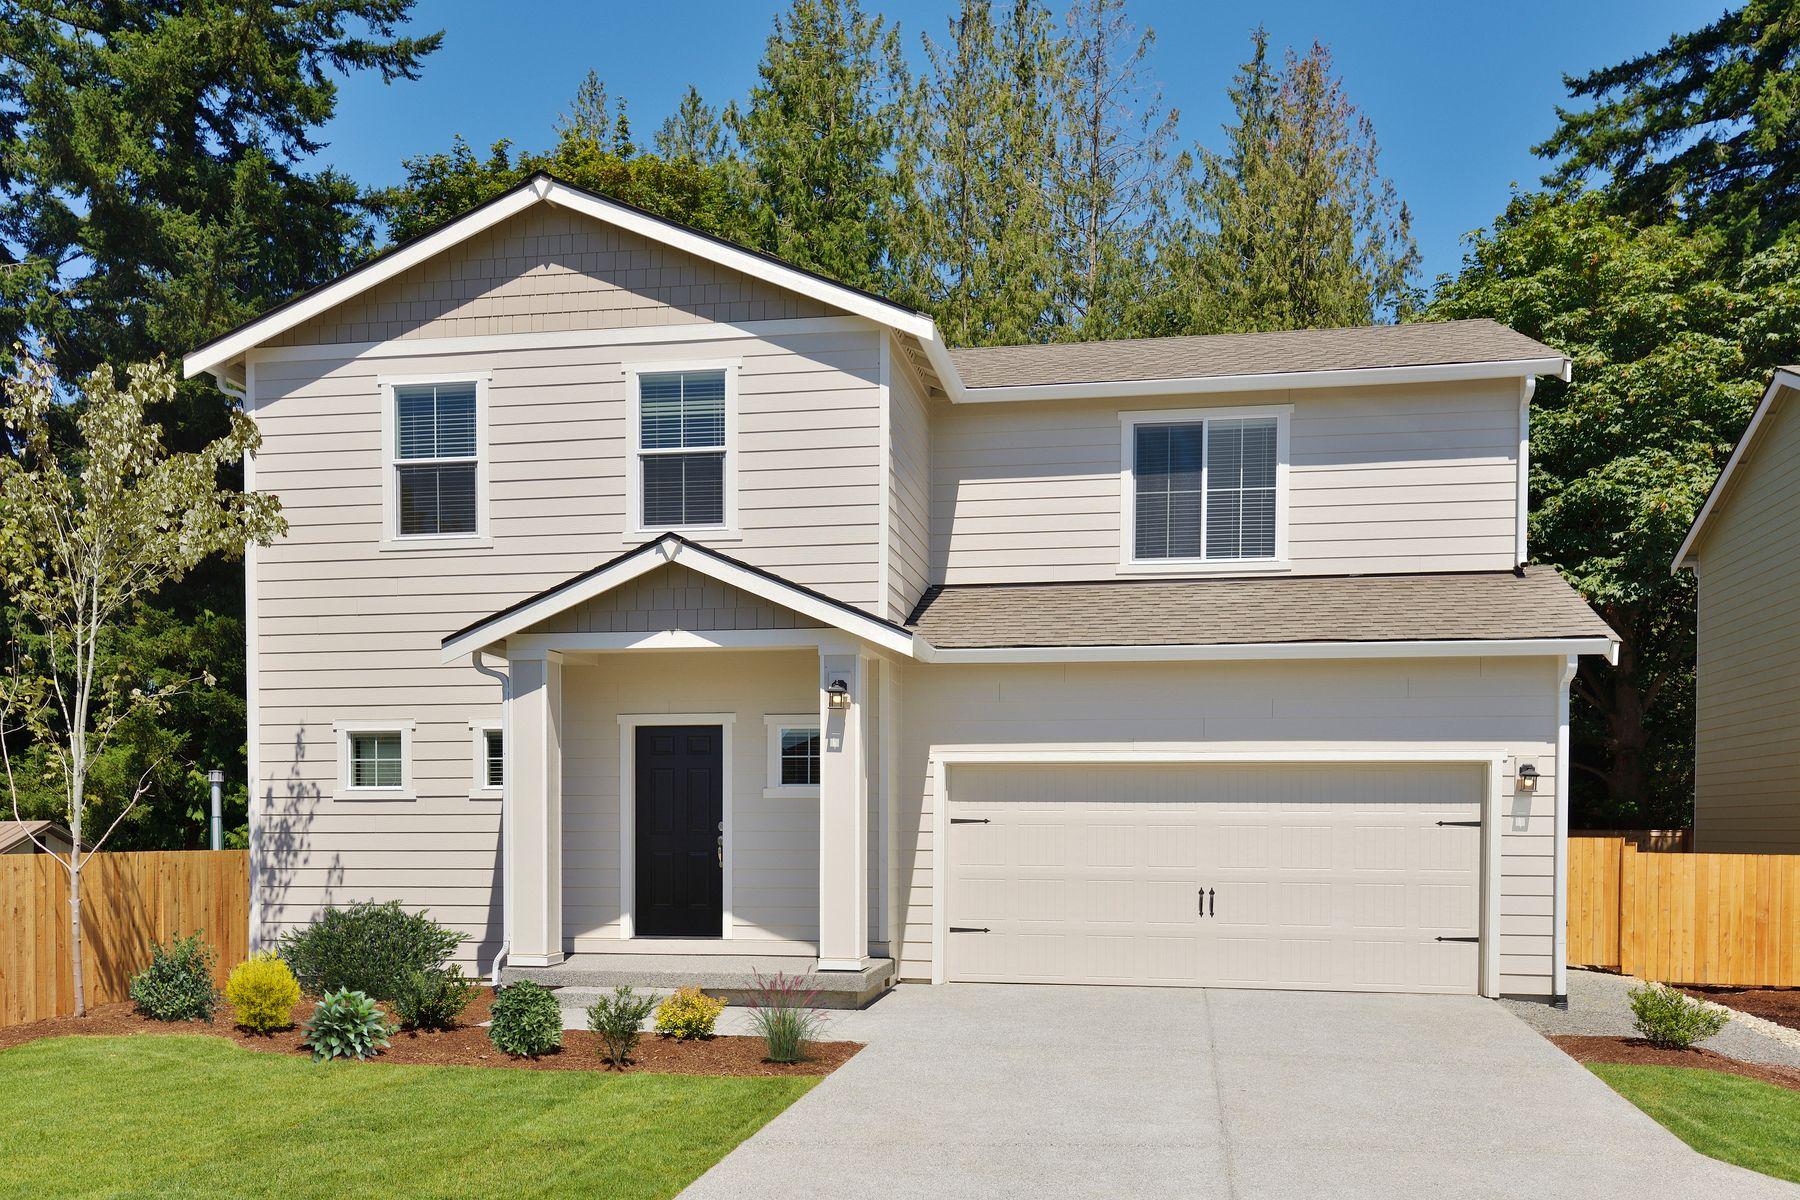 The Fox by LGI Homes at Cedar Hill Estates:The Fox by LGI Homes at Cedar Hill Estates